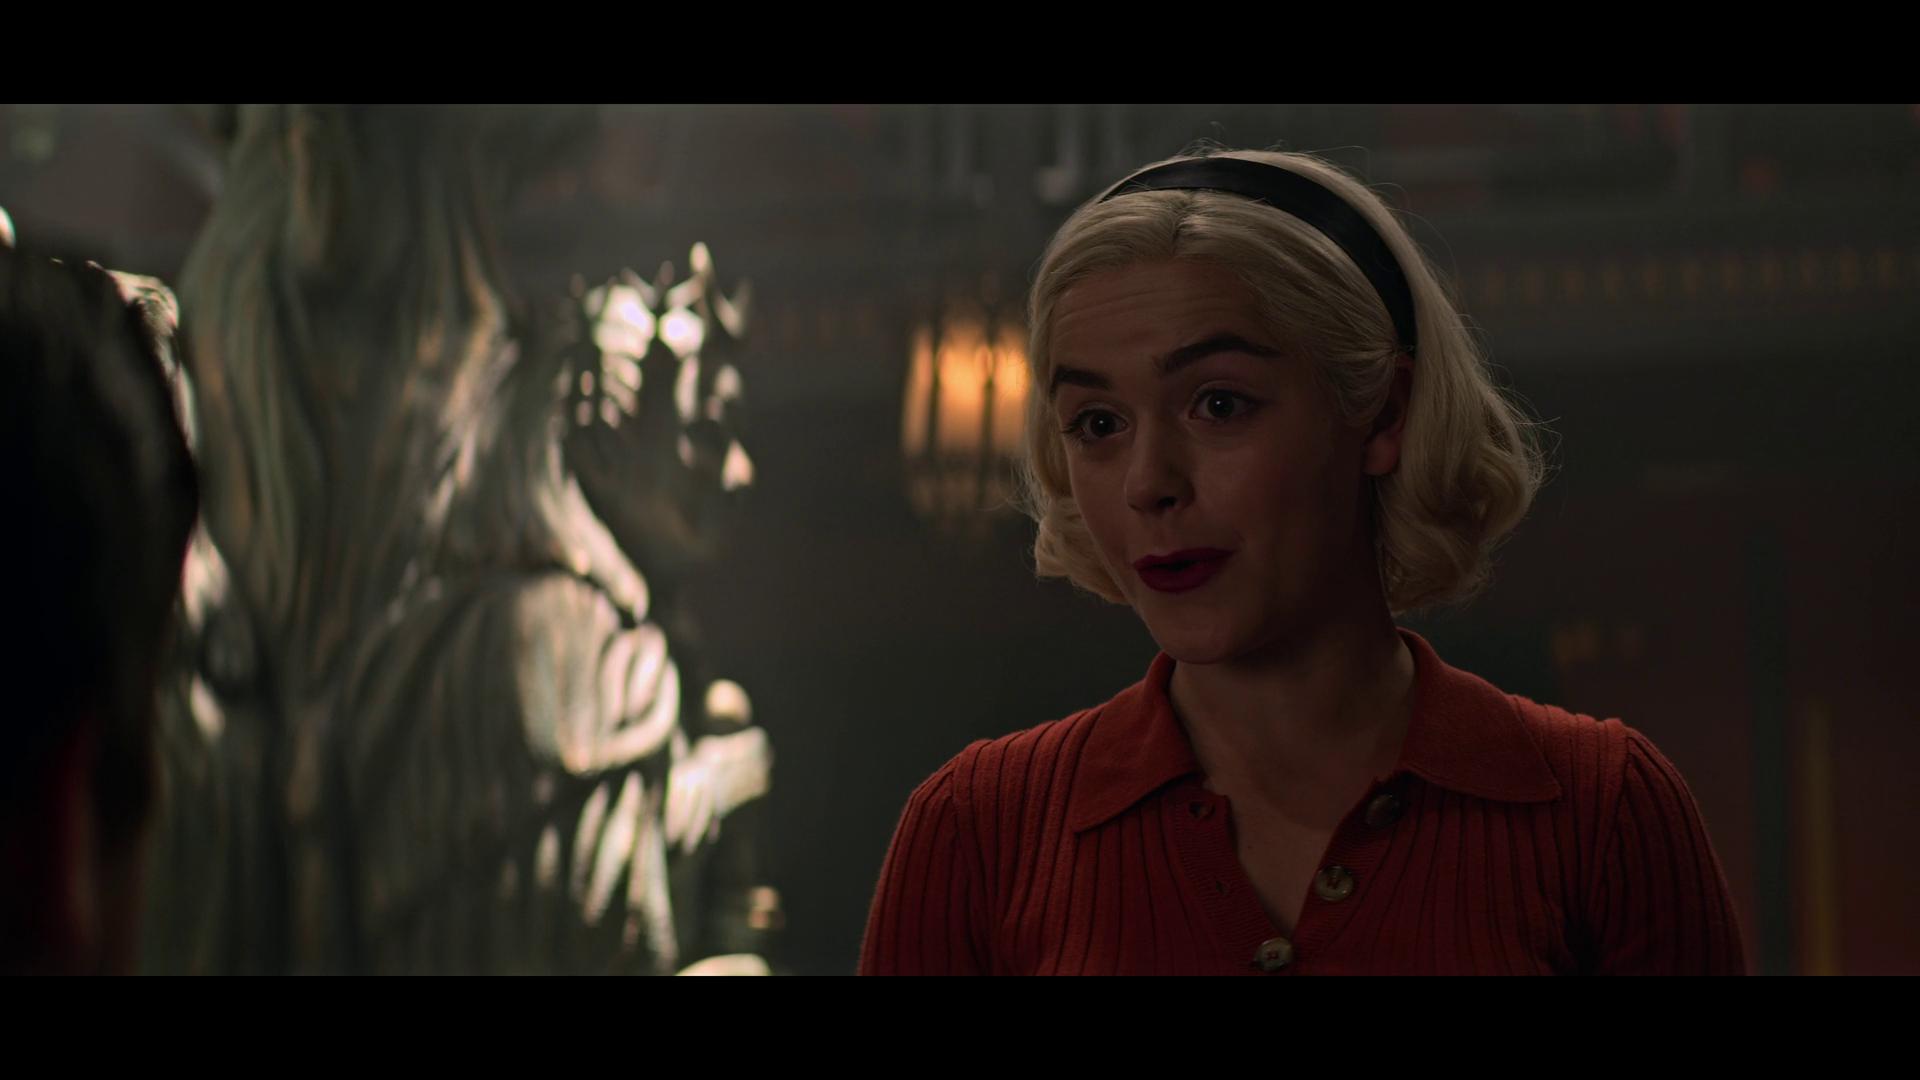 El mundo oculto de Sabrina (2020) Temporada 4 1080p WEB-DL Latino